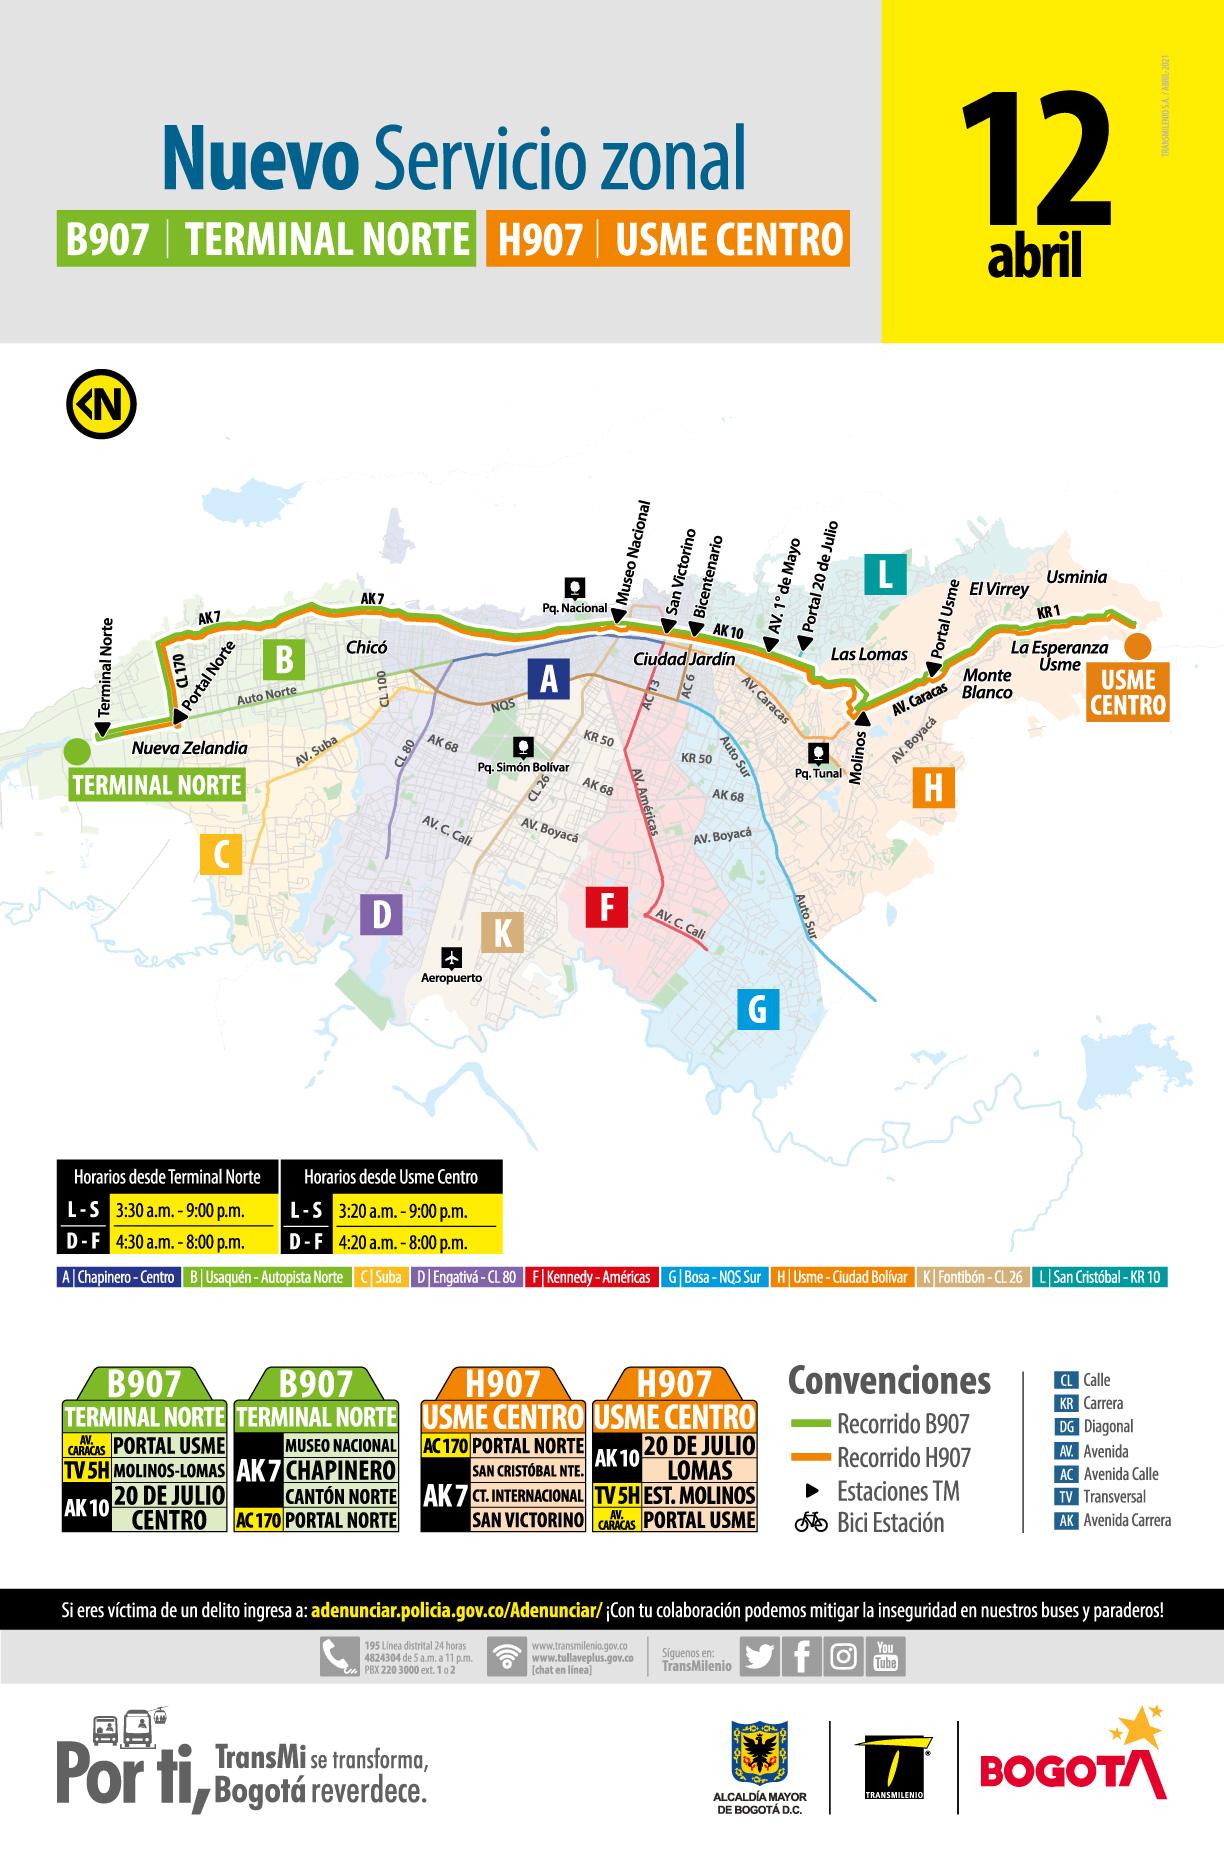 La nueva ruta B907 Terminal Norte - H907 Usme Centro que conecta Terminal Norte con Usme Centro